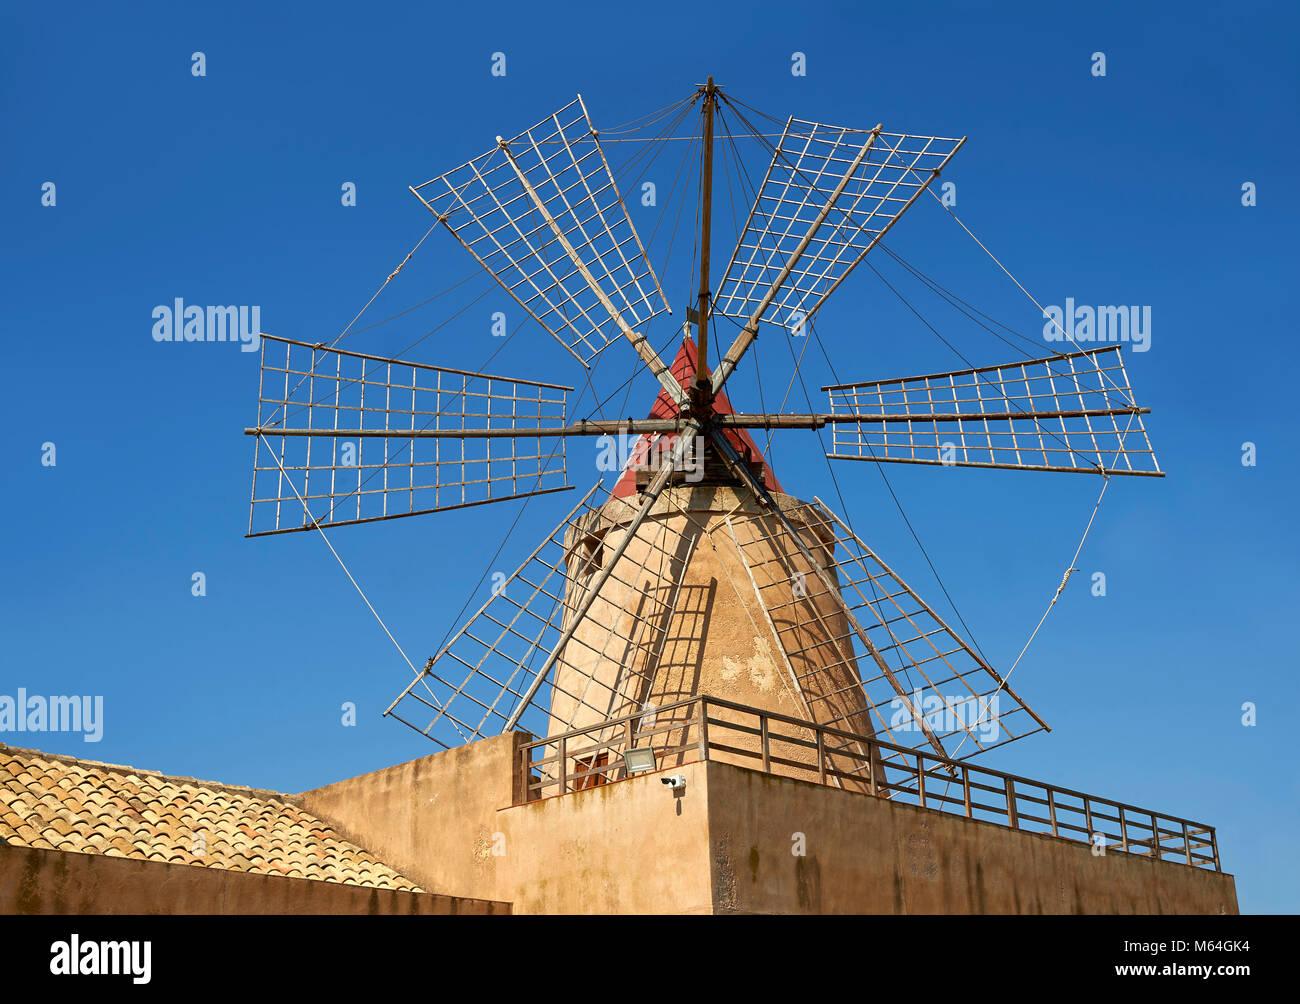 Le Mulino d'Infersa (moulin de Infersa) wind mill, Ettore salines, Salins della Laguna, Masala, en Sicile. Photo Stock